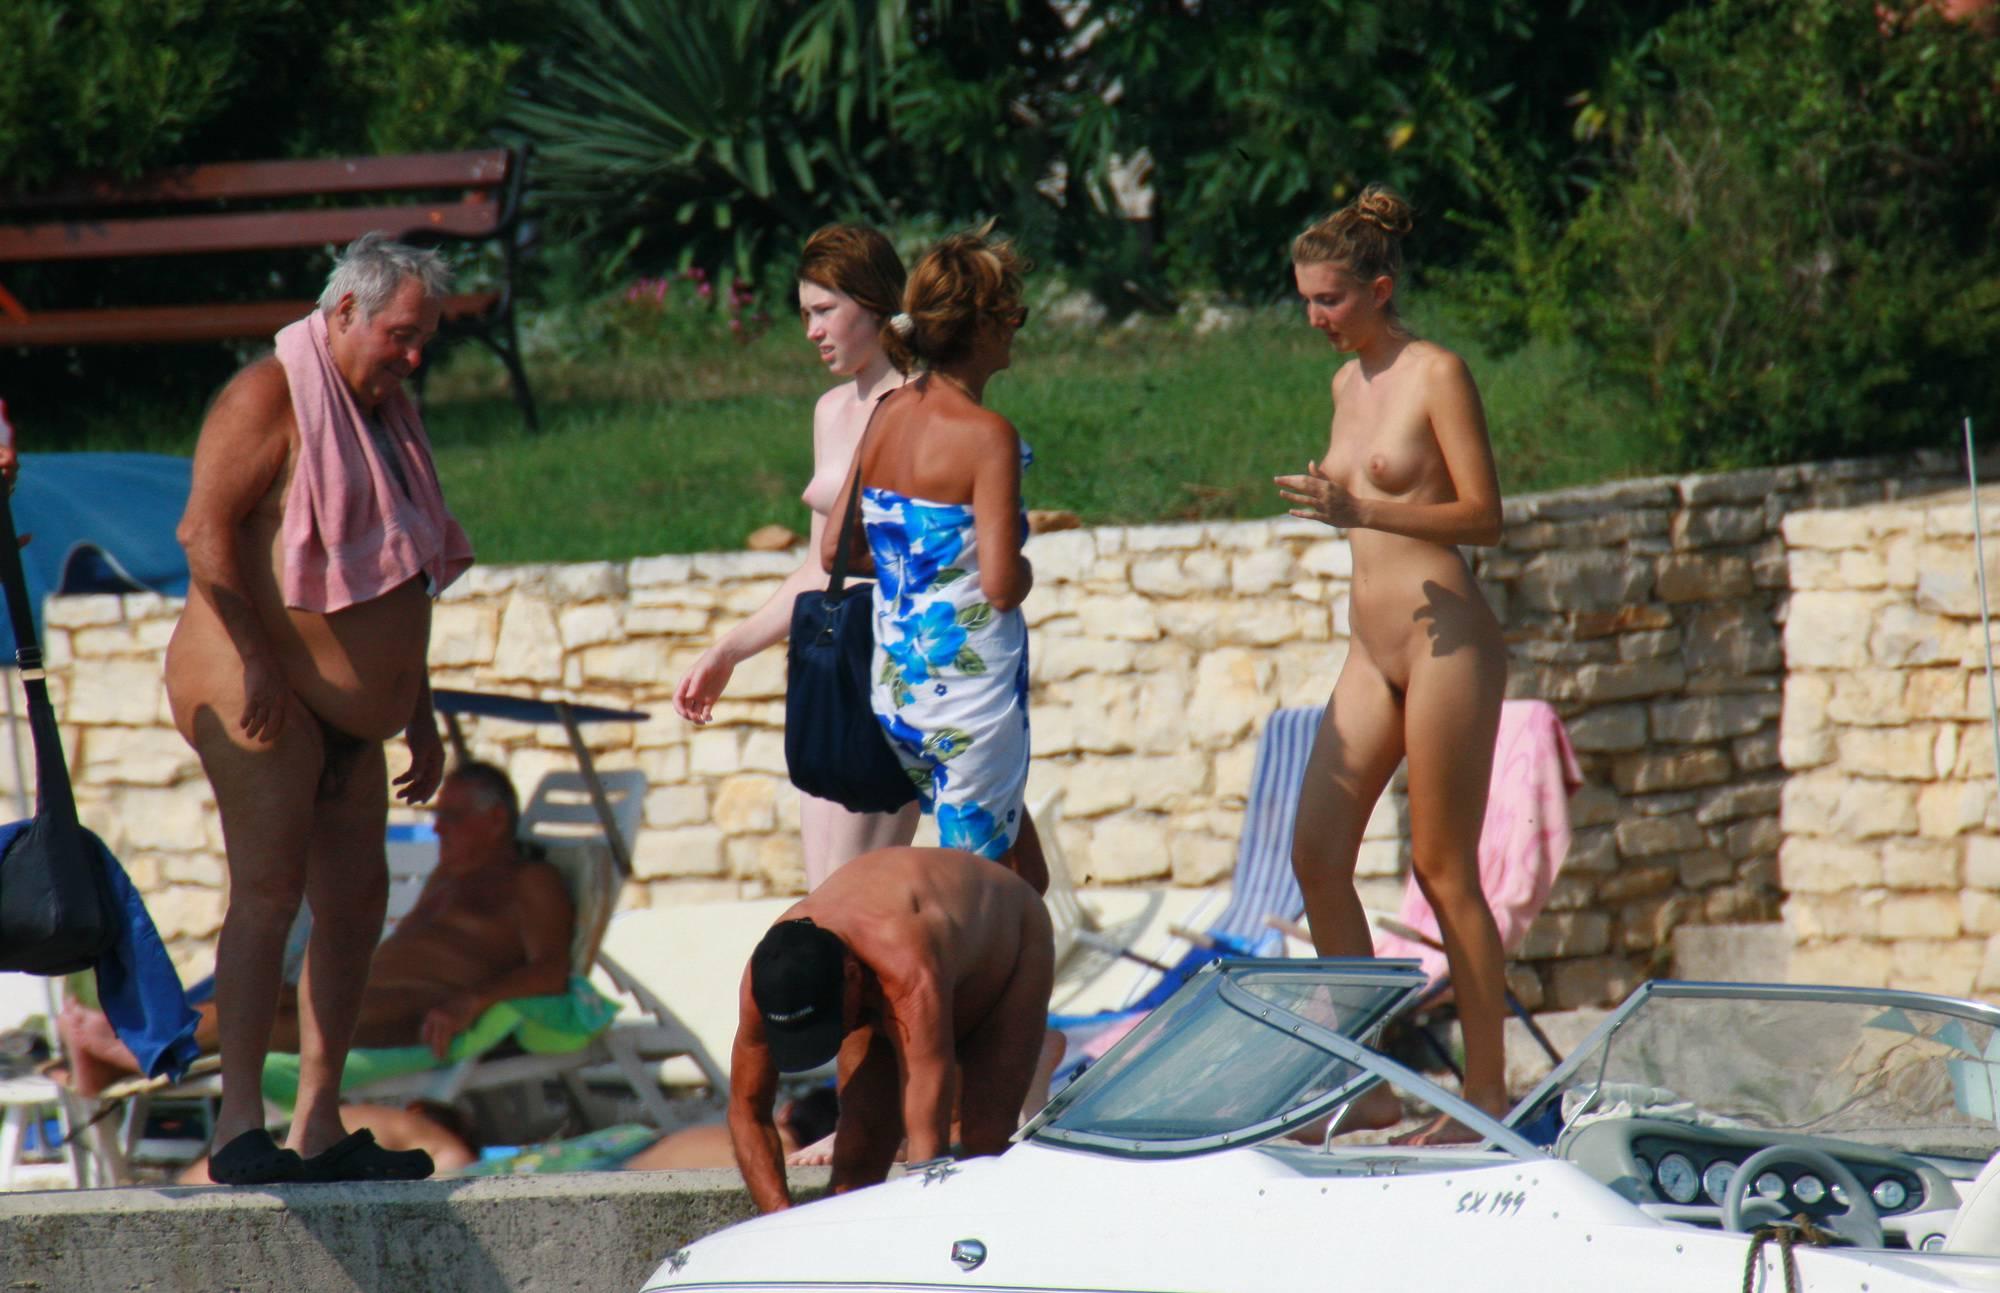 Purenudism Photos Nude Duet On-Water Slab - 1